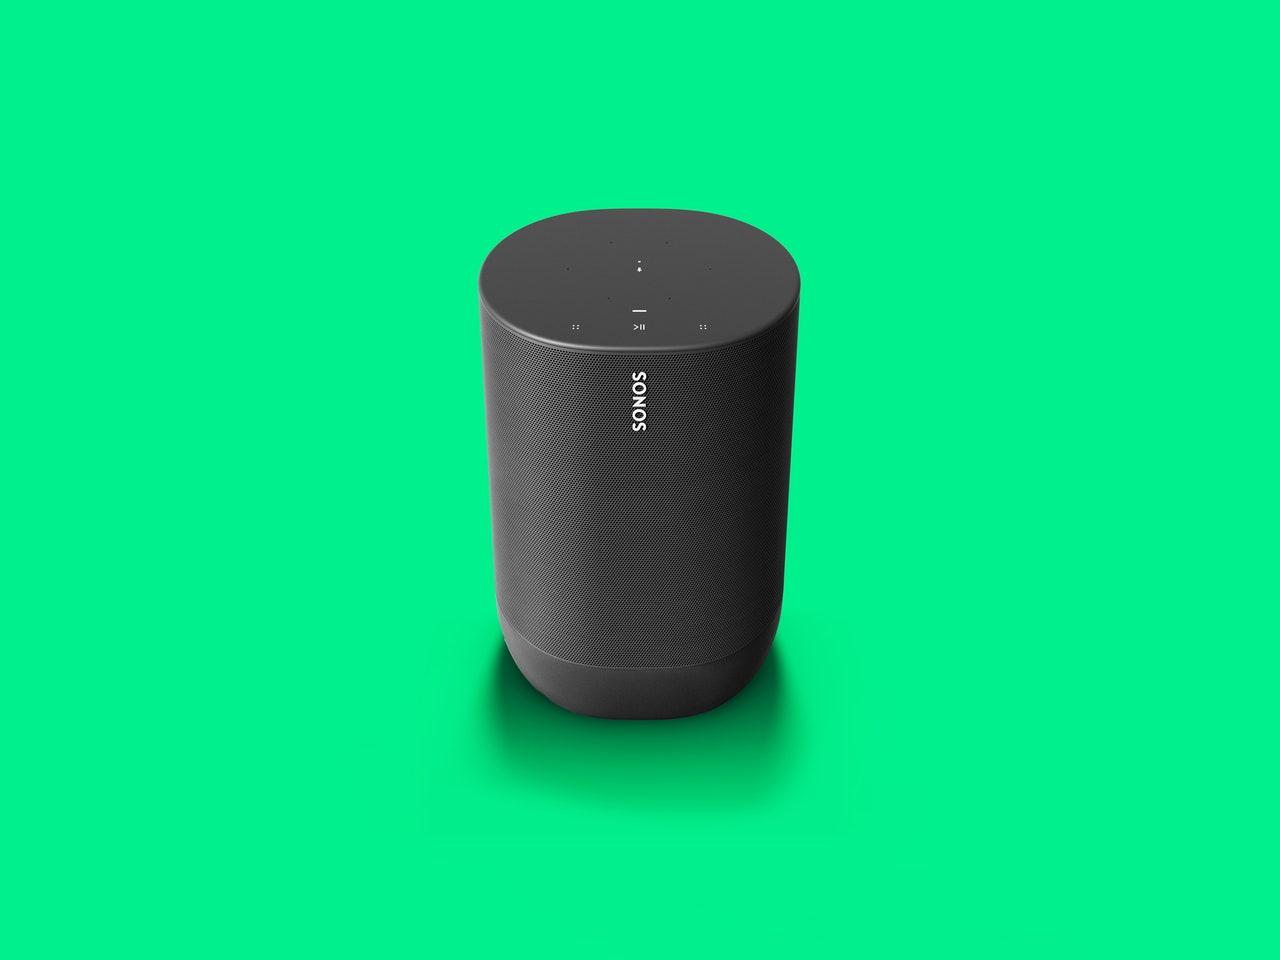 Loa Sonos Move